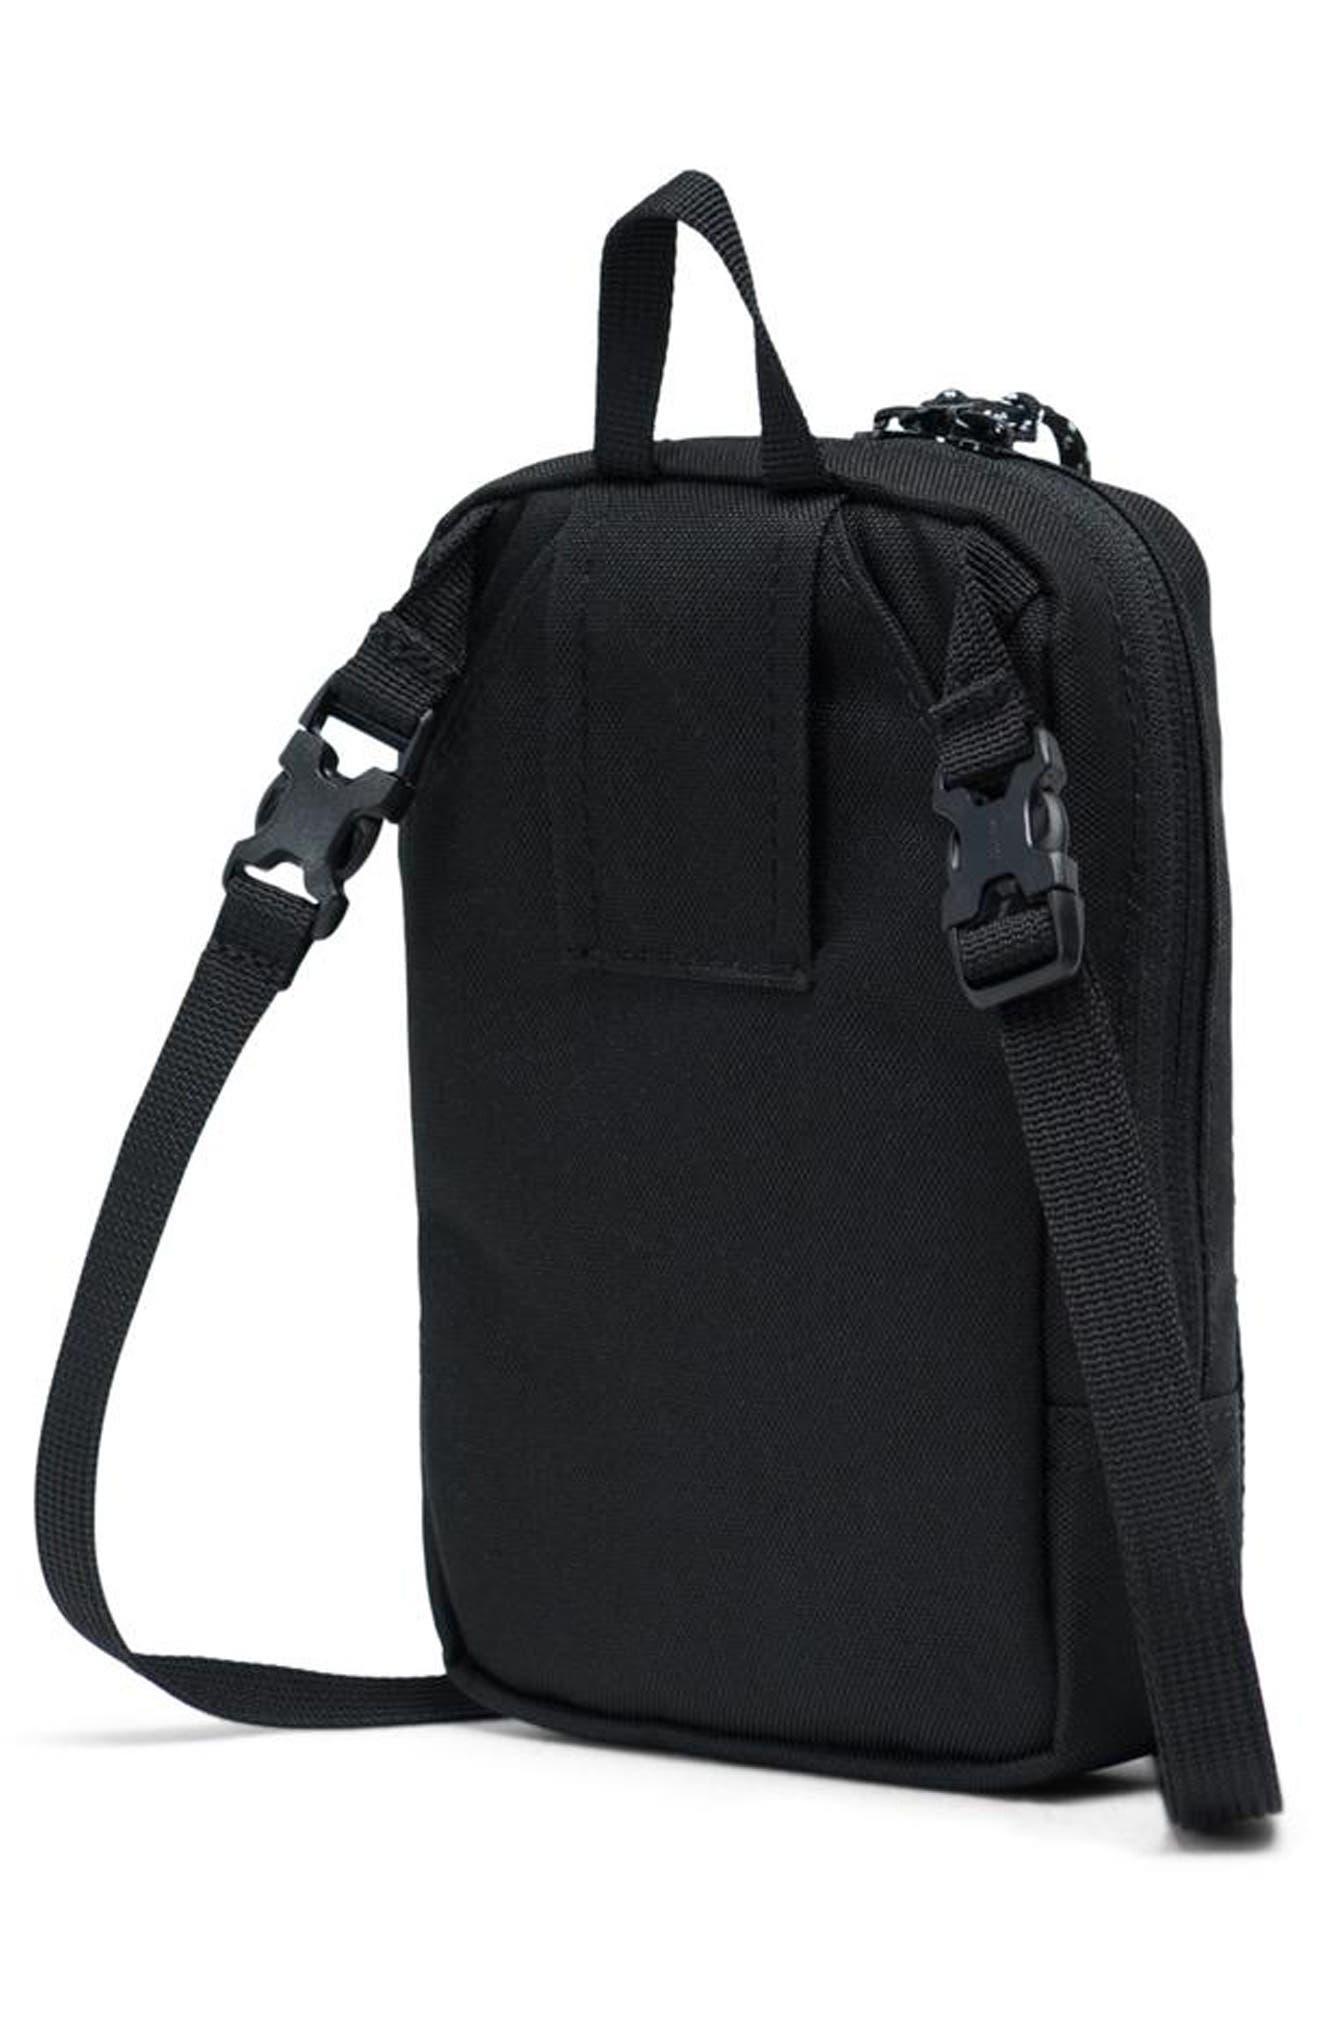 HERSCHEL SUPPLY CO., Large Sinclair Crossbody Bag, Alternate thumbnail 2, color, BLACK